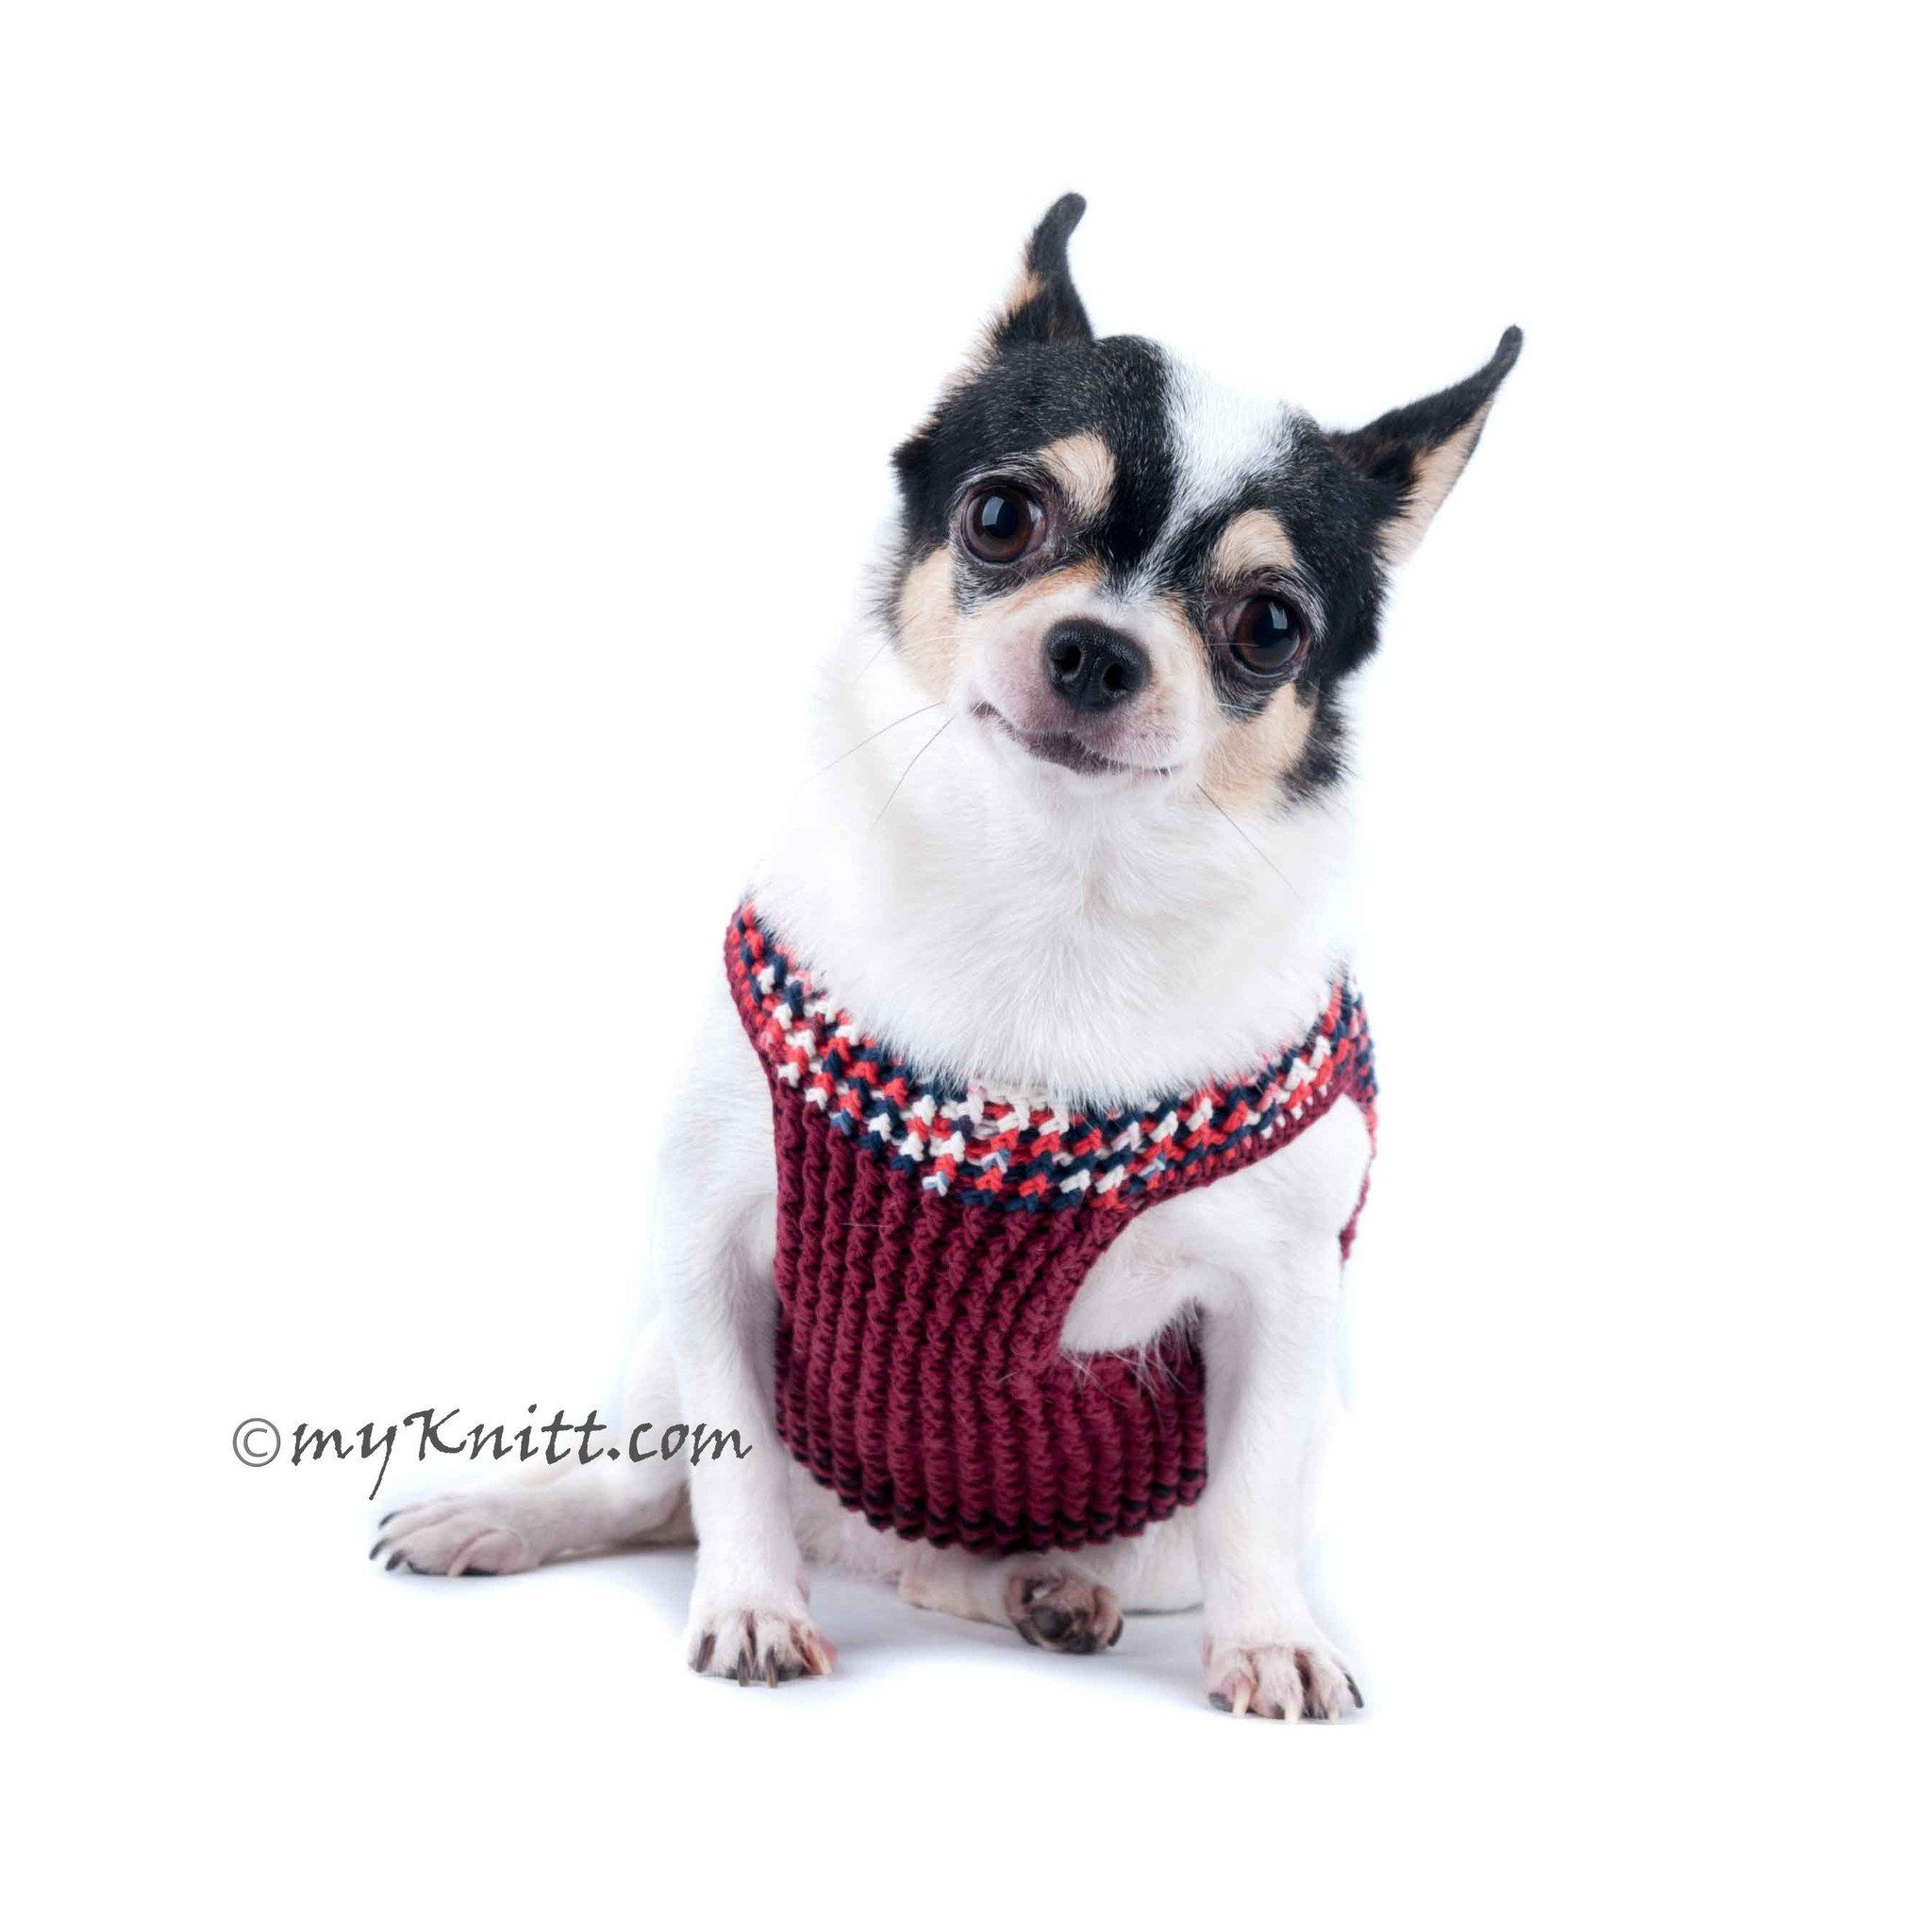 Sembadesign Shared A New Photo On Dog Harness Cute Chihuahua